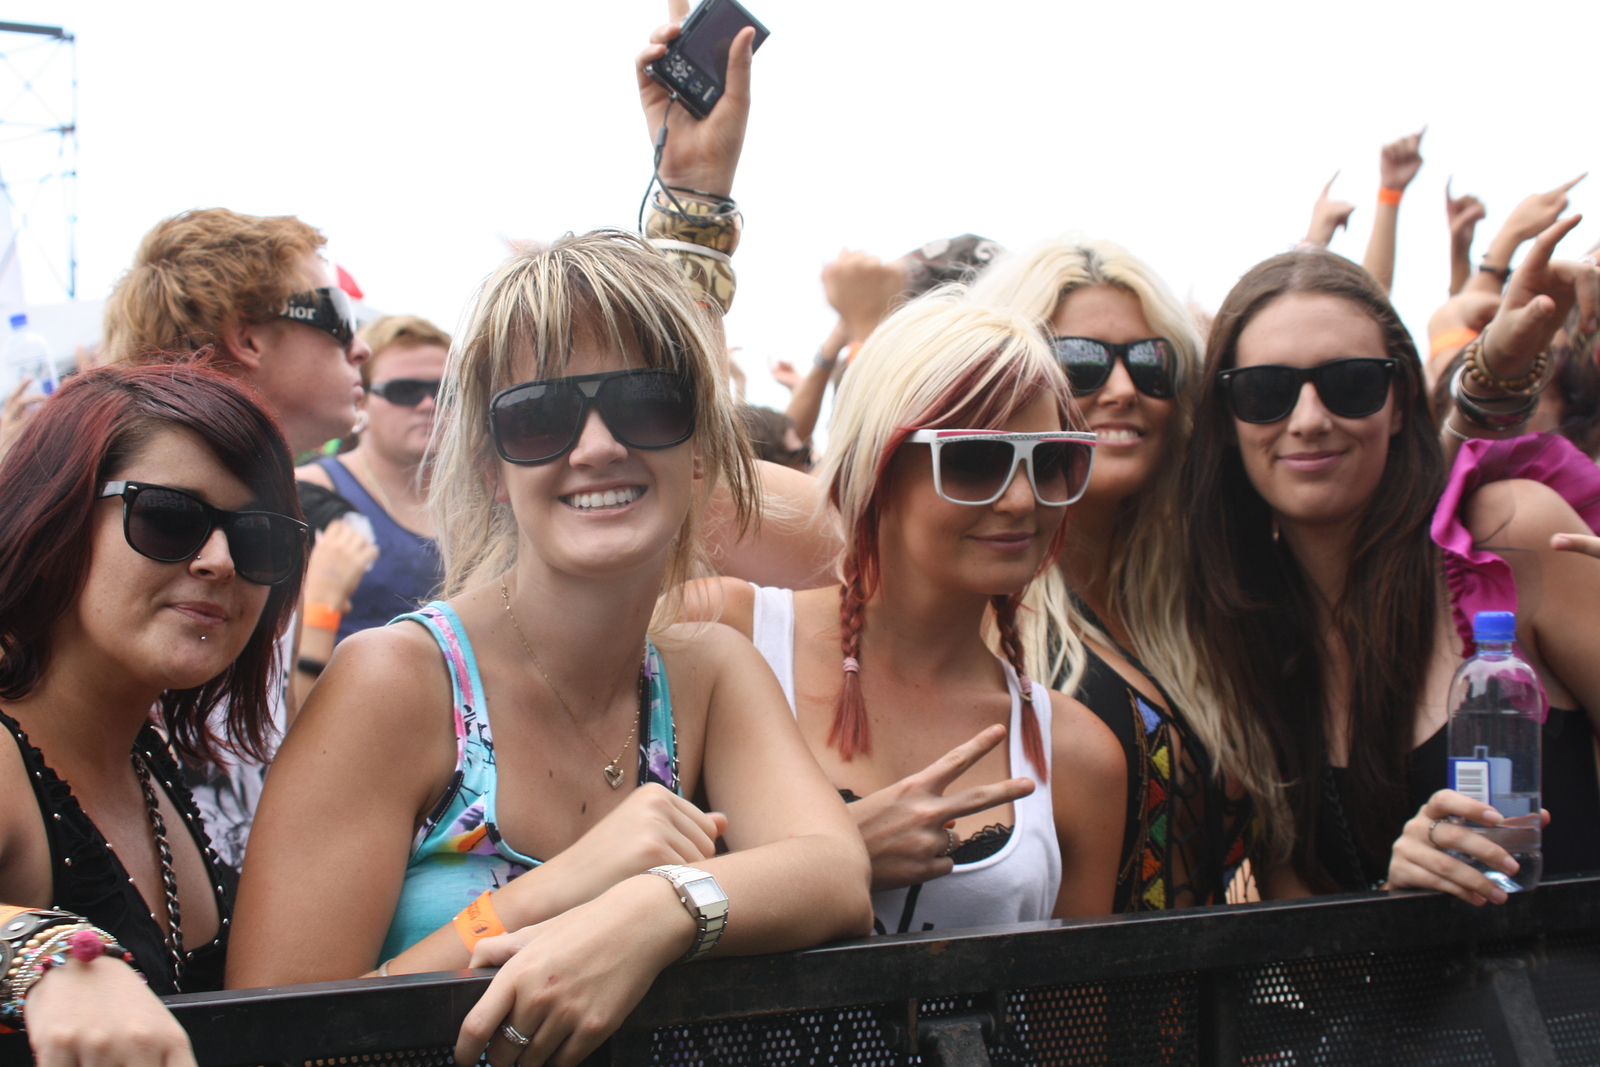 bigstock-Fans-at-a-Festival-CONCERT-CRO-7117699.jpg